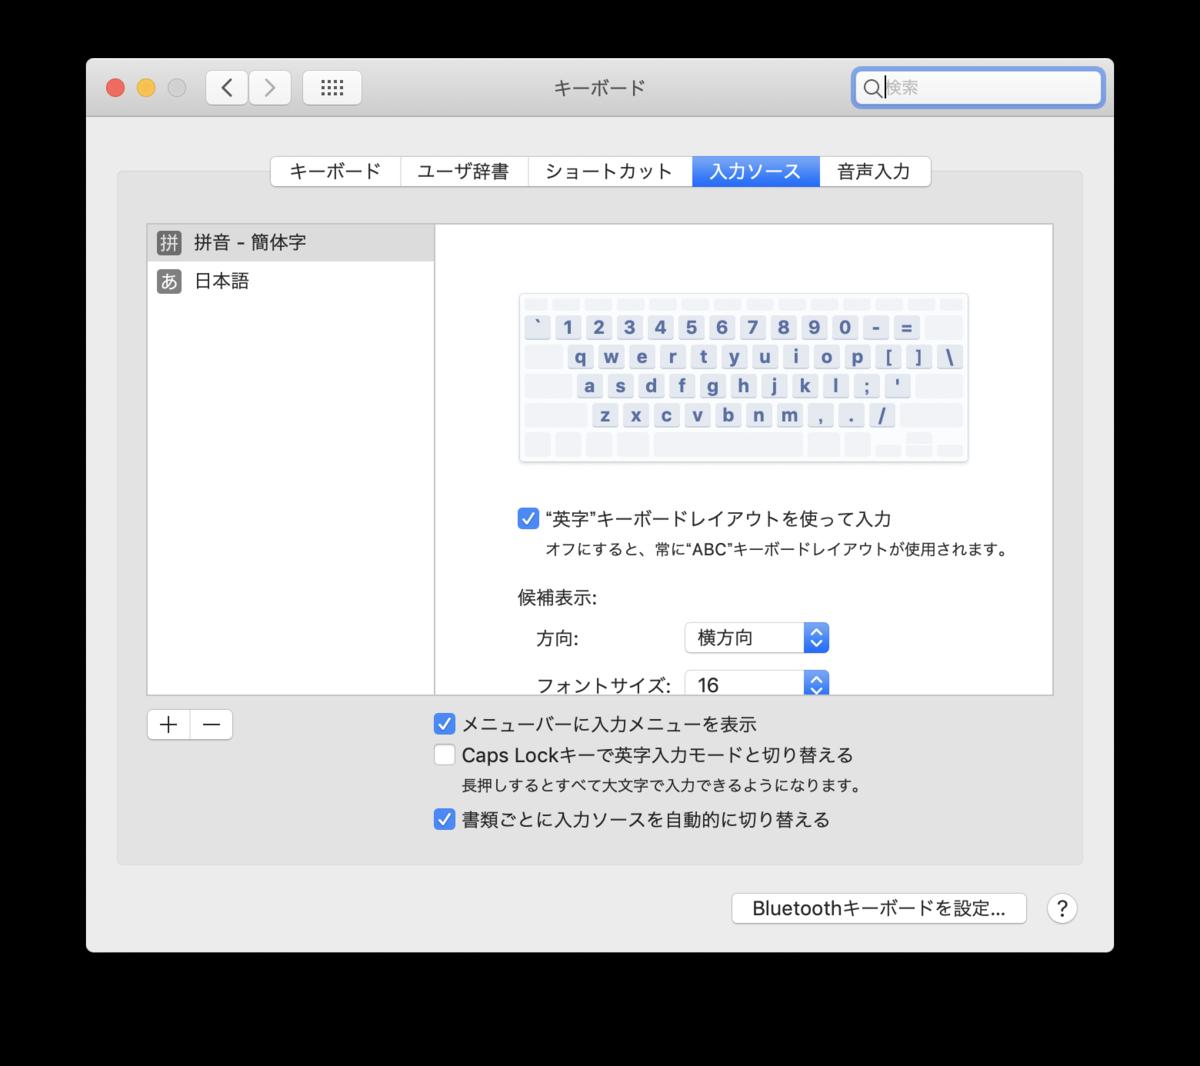 macOSでの例